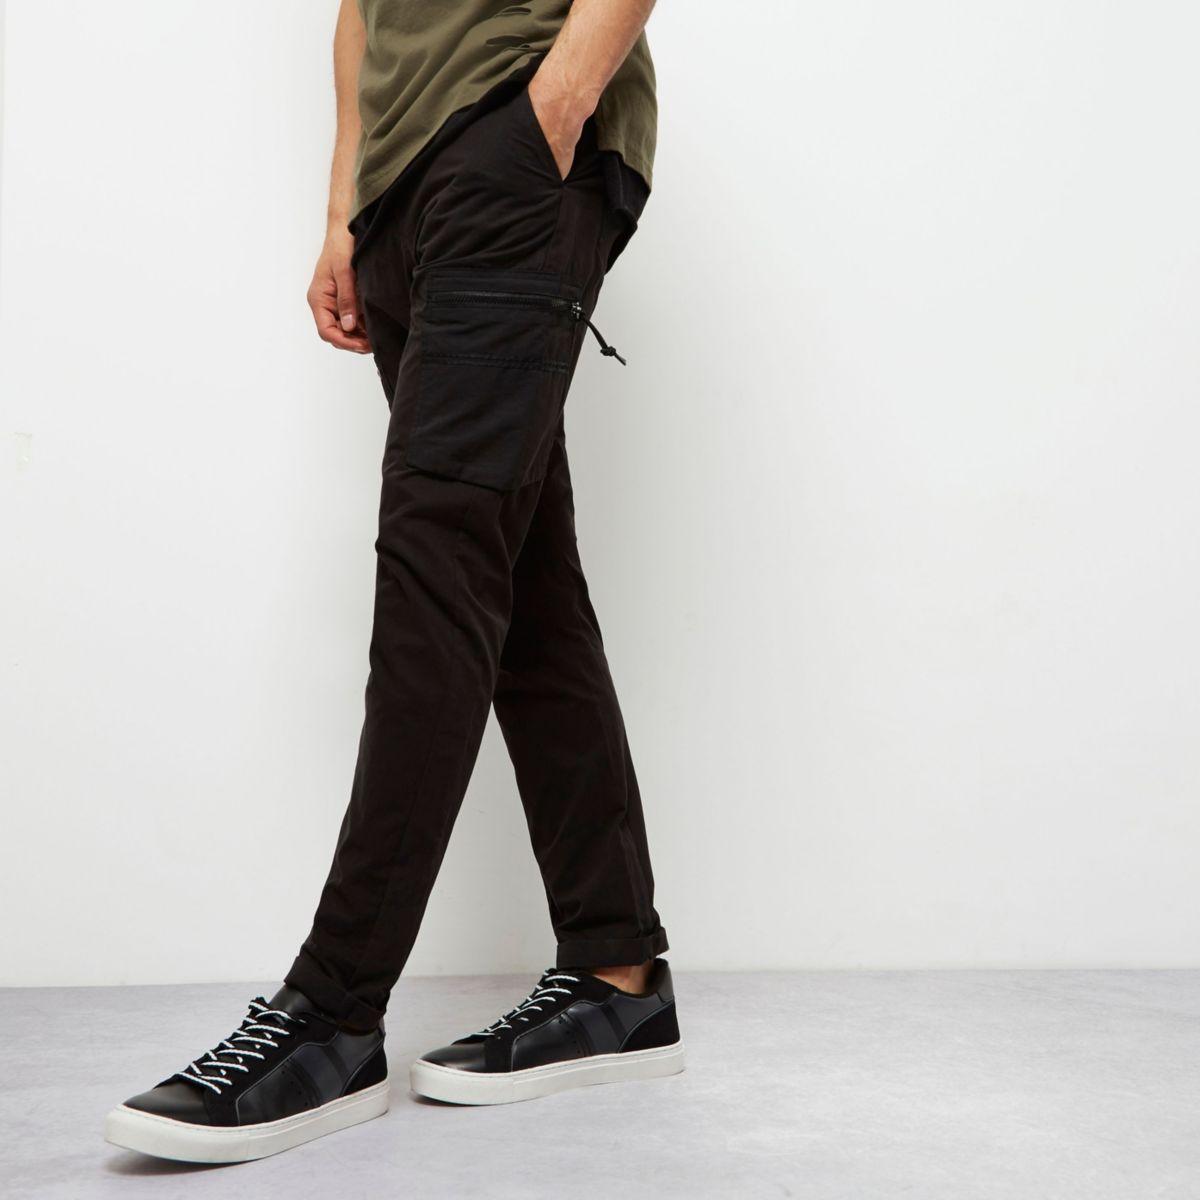 Black skinny fit cargo pants